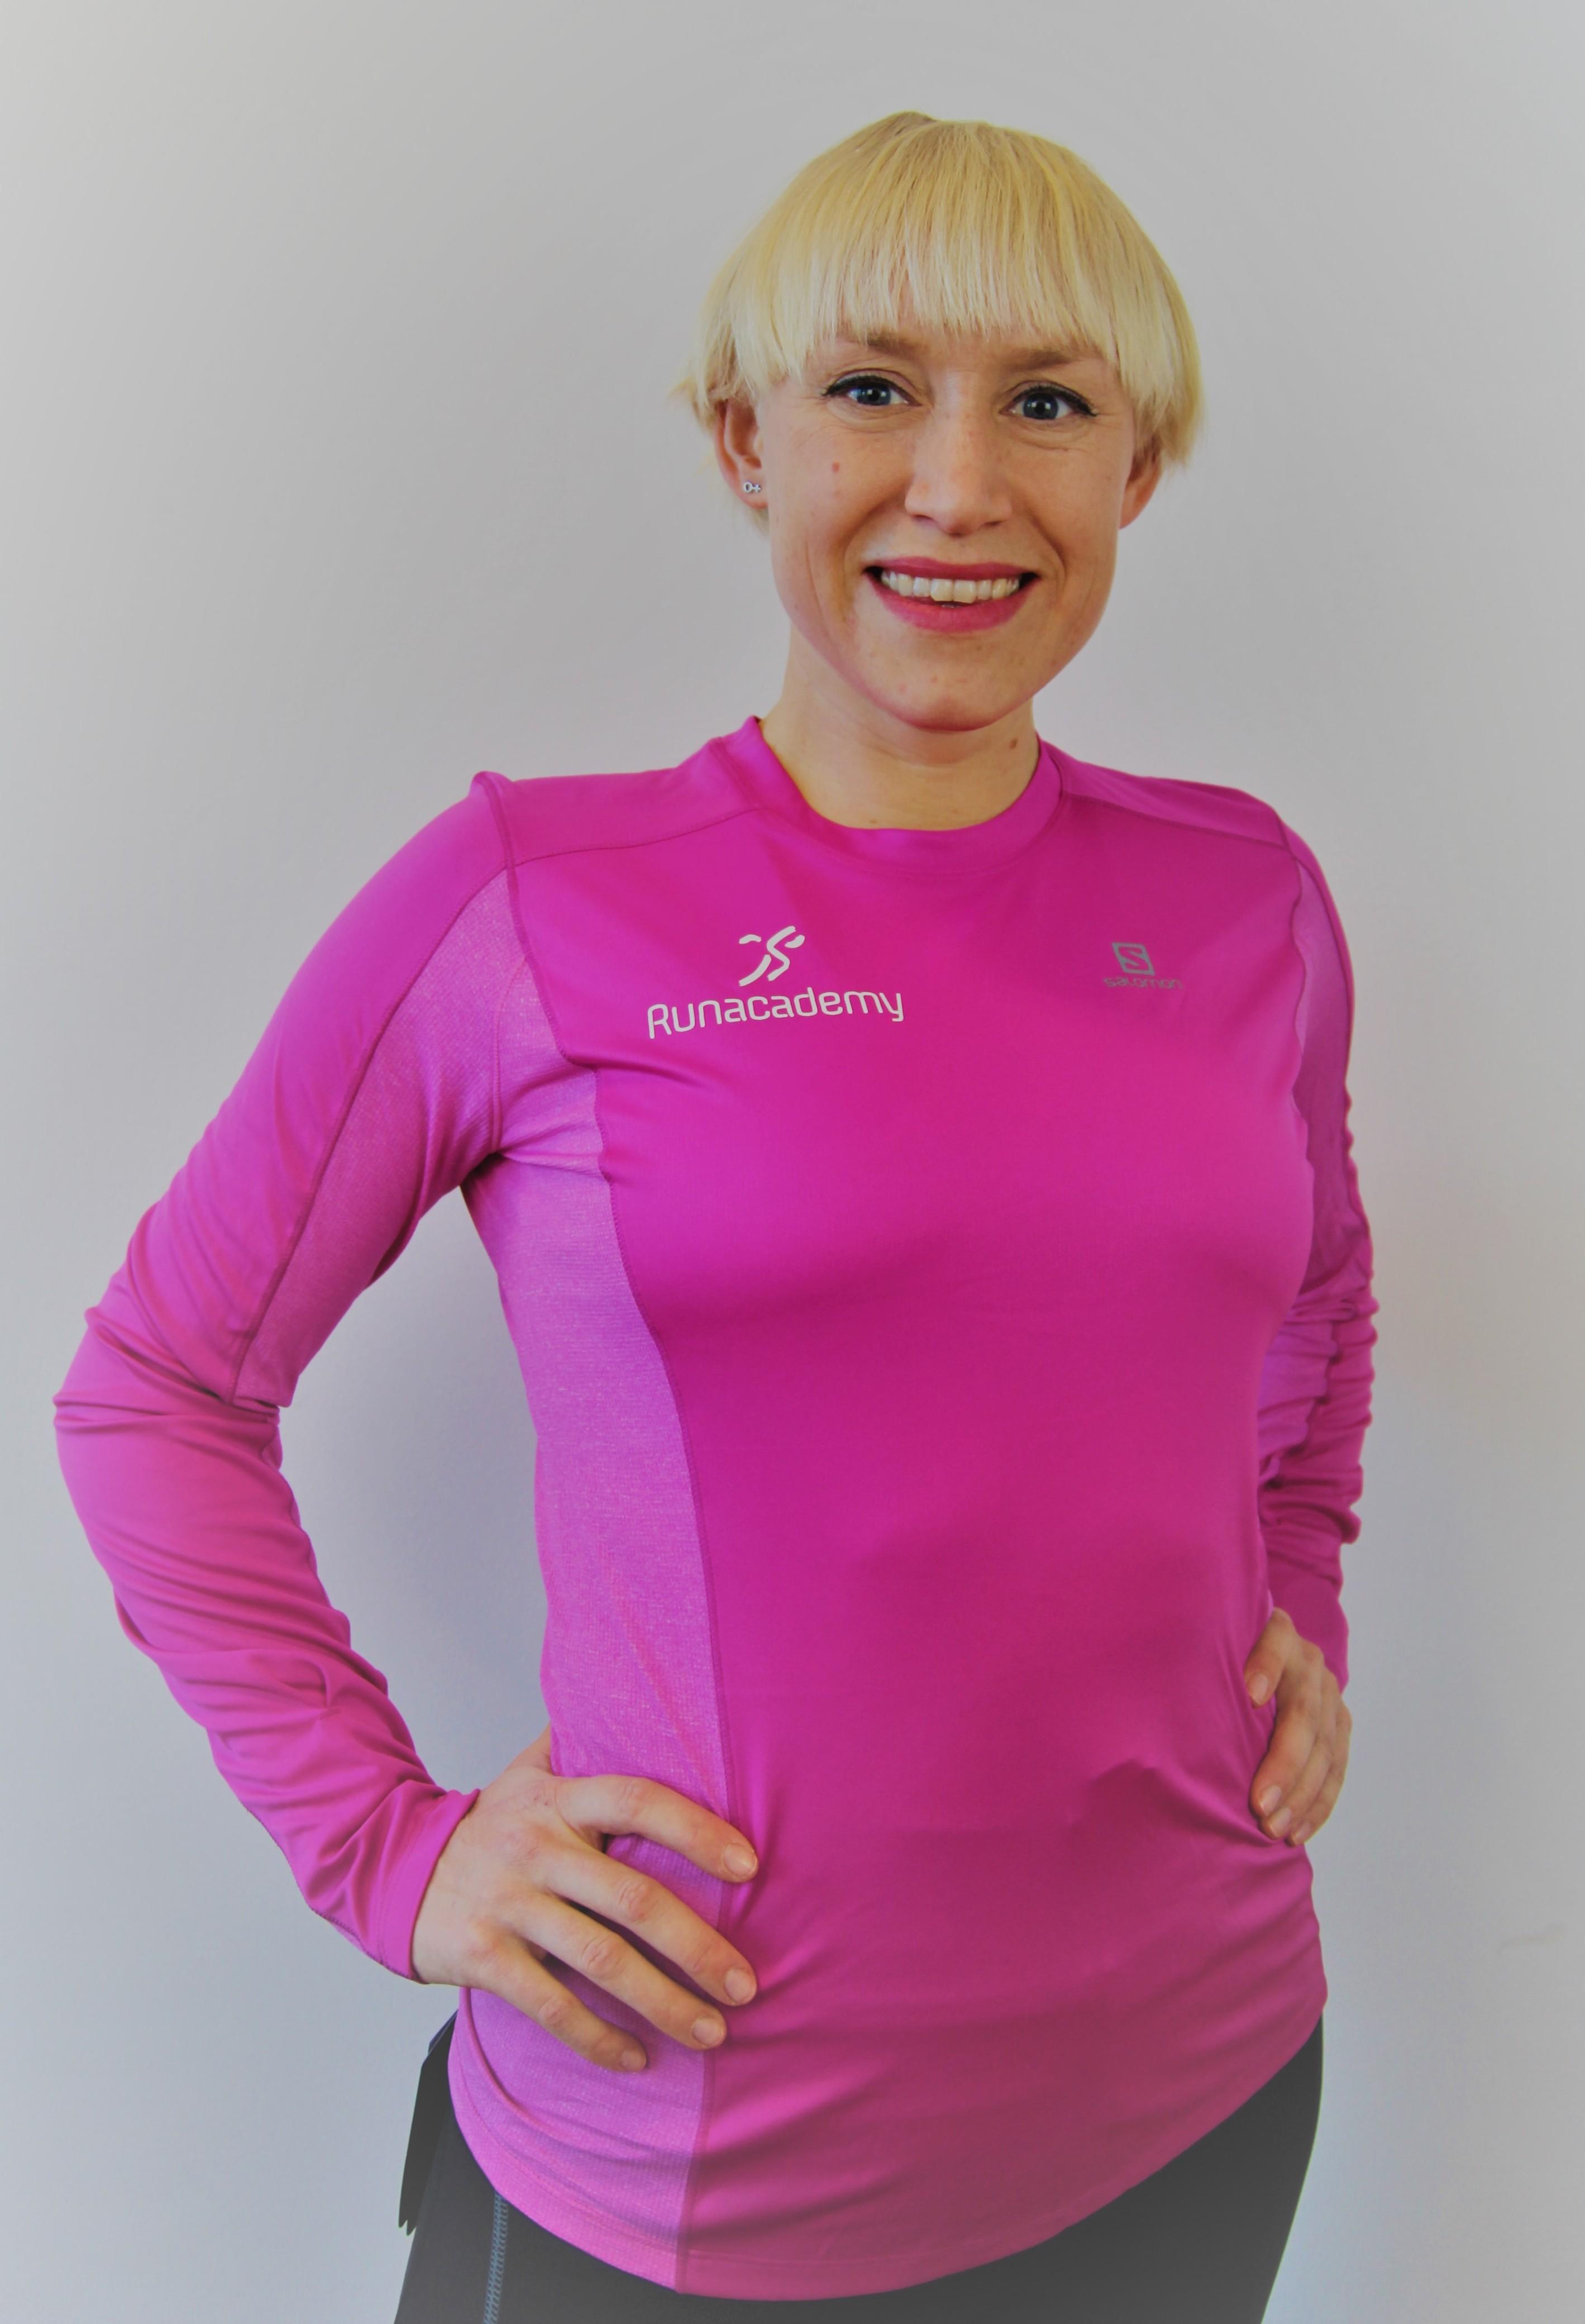 rosa tröja fram